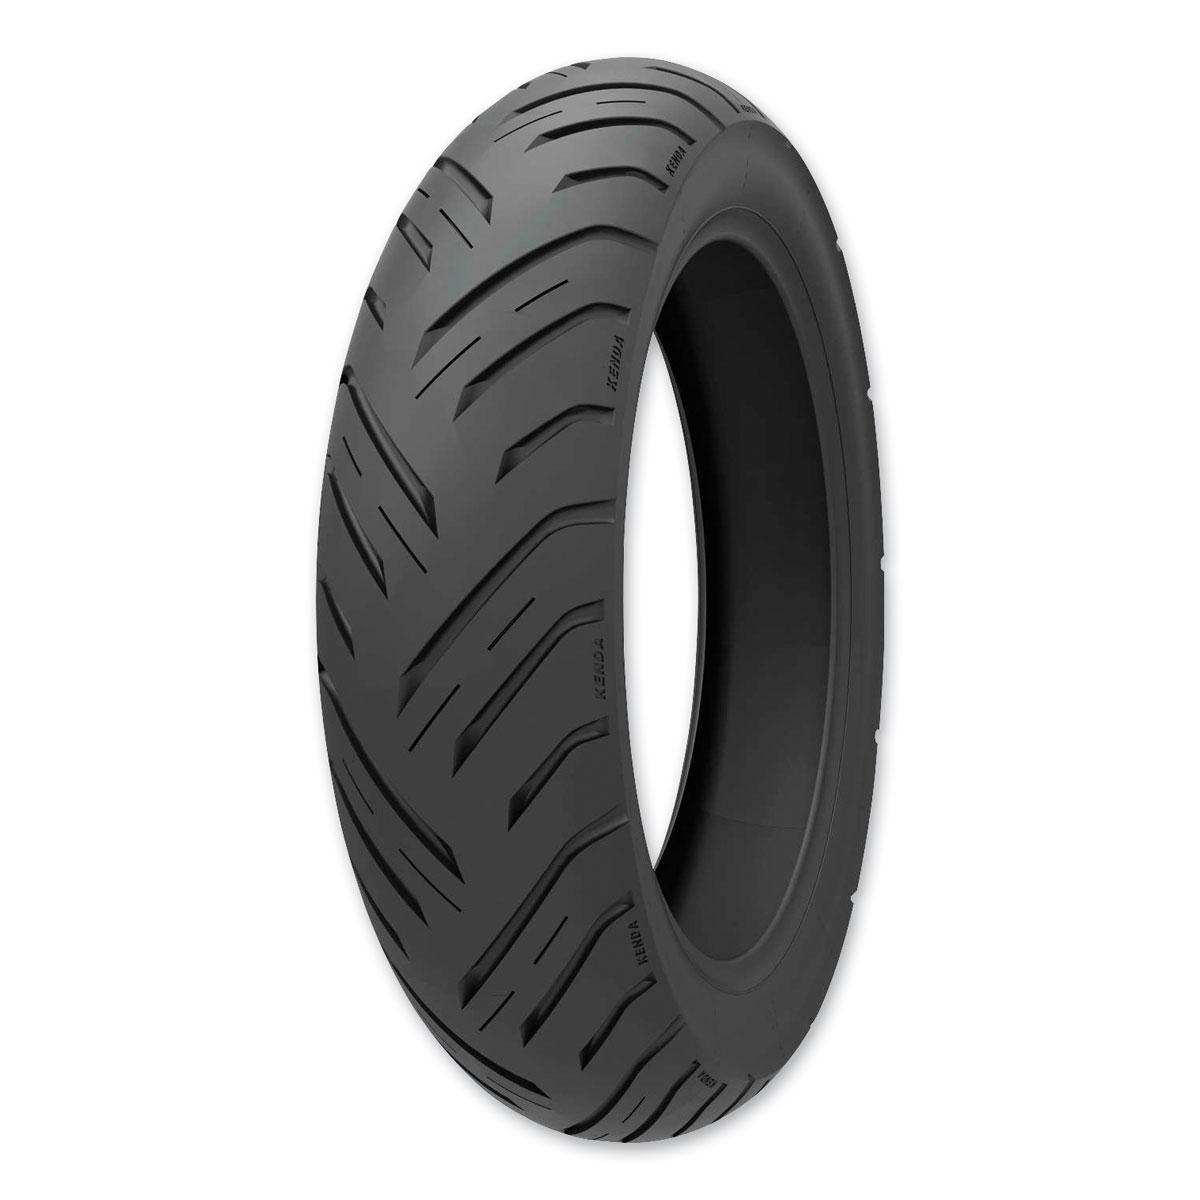 Kenda Tires K676 Retroactive 150/80-16 Rear Tire